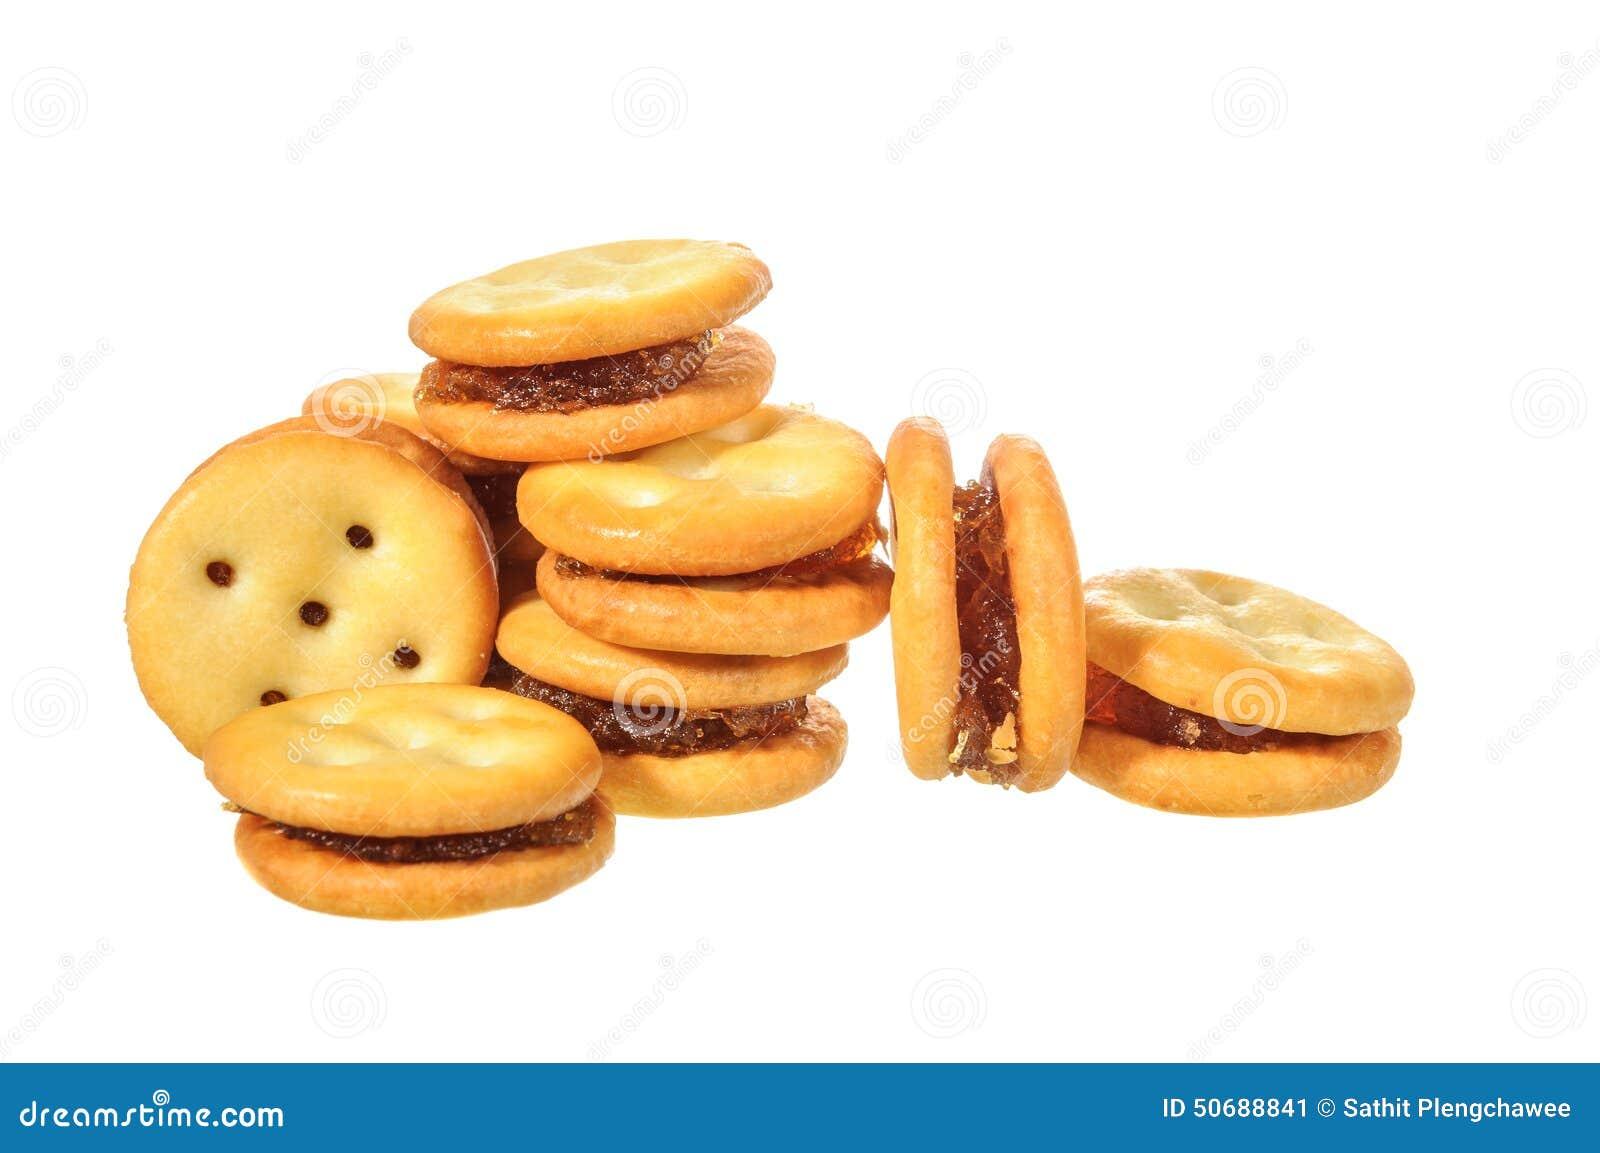 Download 菠萝饼干 库存图片. 图片 包括有 制动手, 空白, 平分, 菠萝, 黄色, 堵塞, 快餐, 巴西, 曲奇饼 - 50688841